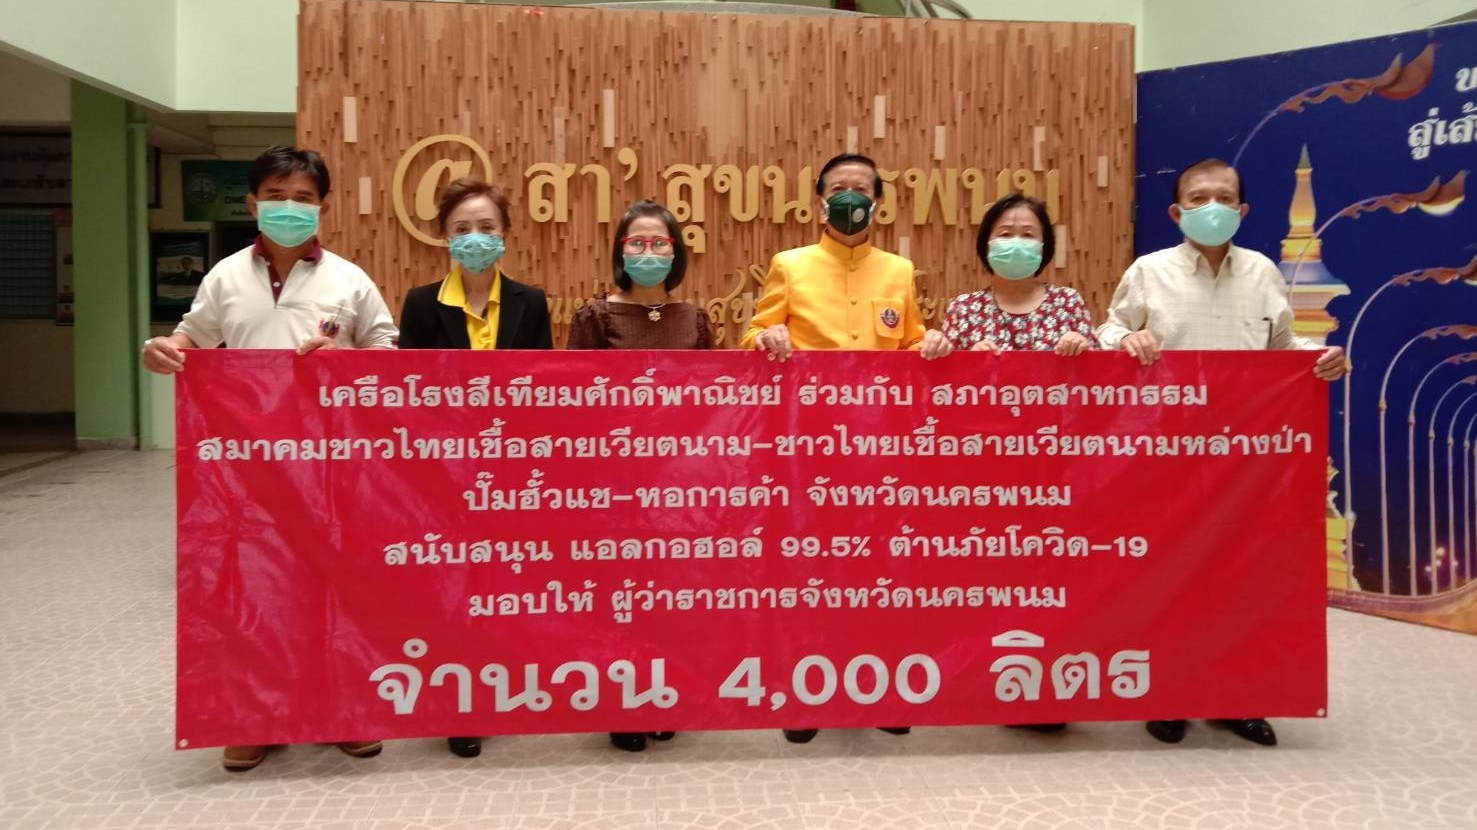 viet nam trao 4000 lit nuoc sat trung ho tro nhan dan nakhon phanom thai lan chong covid 19